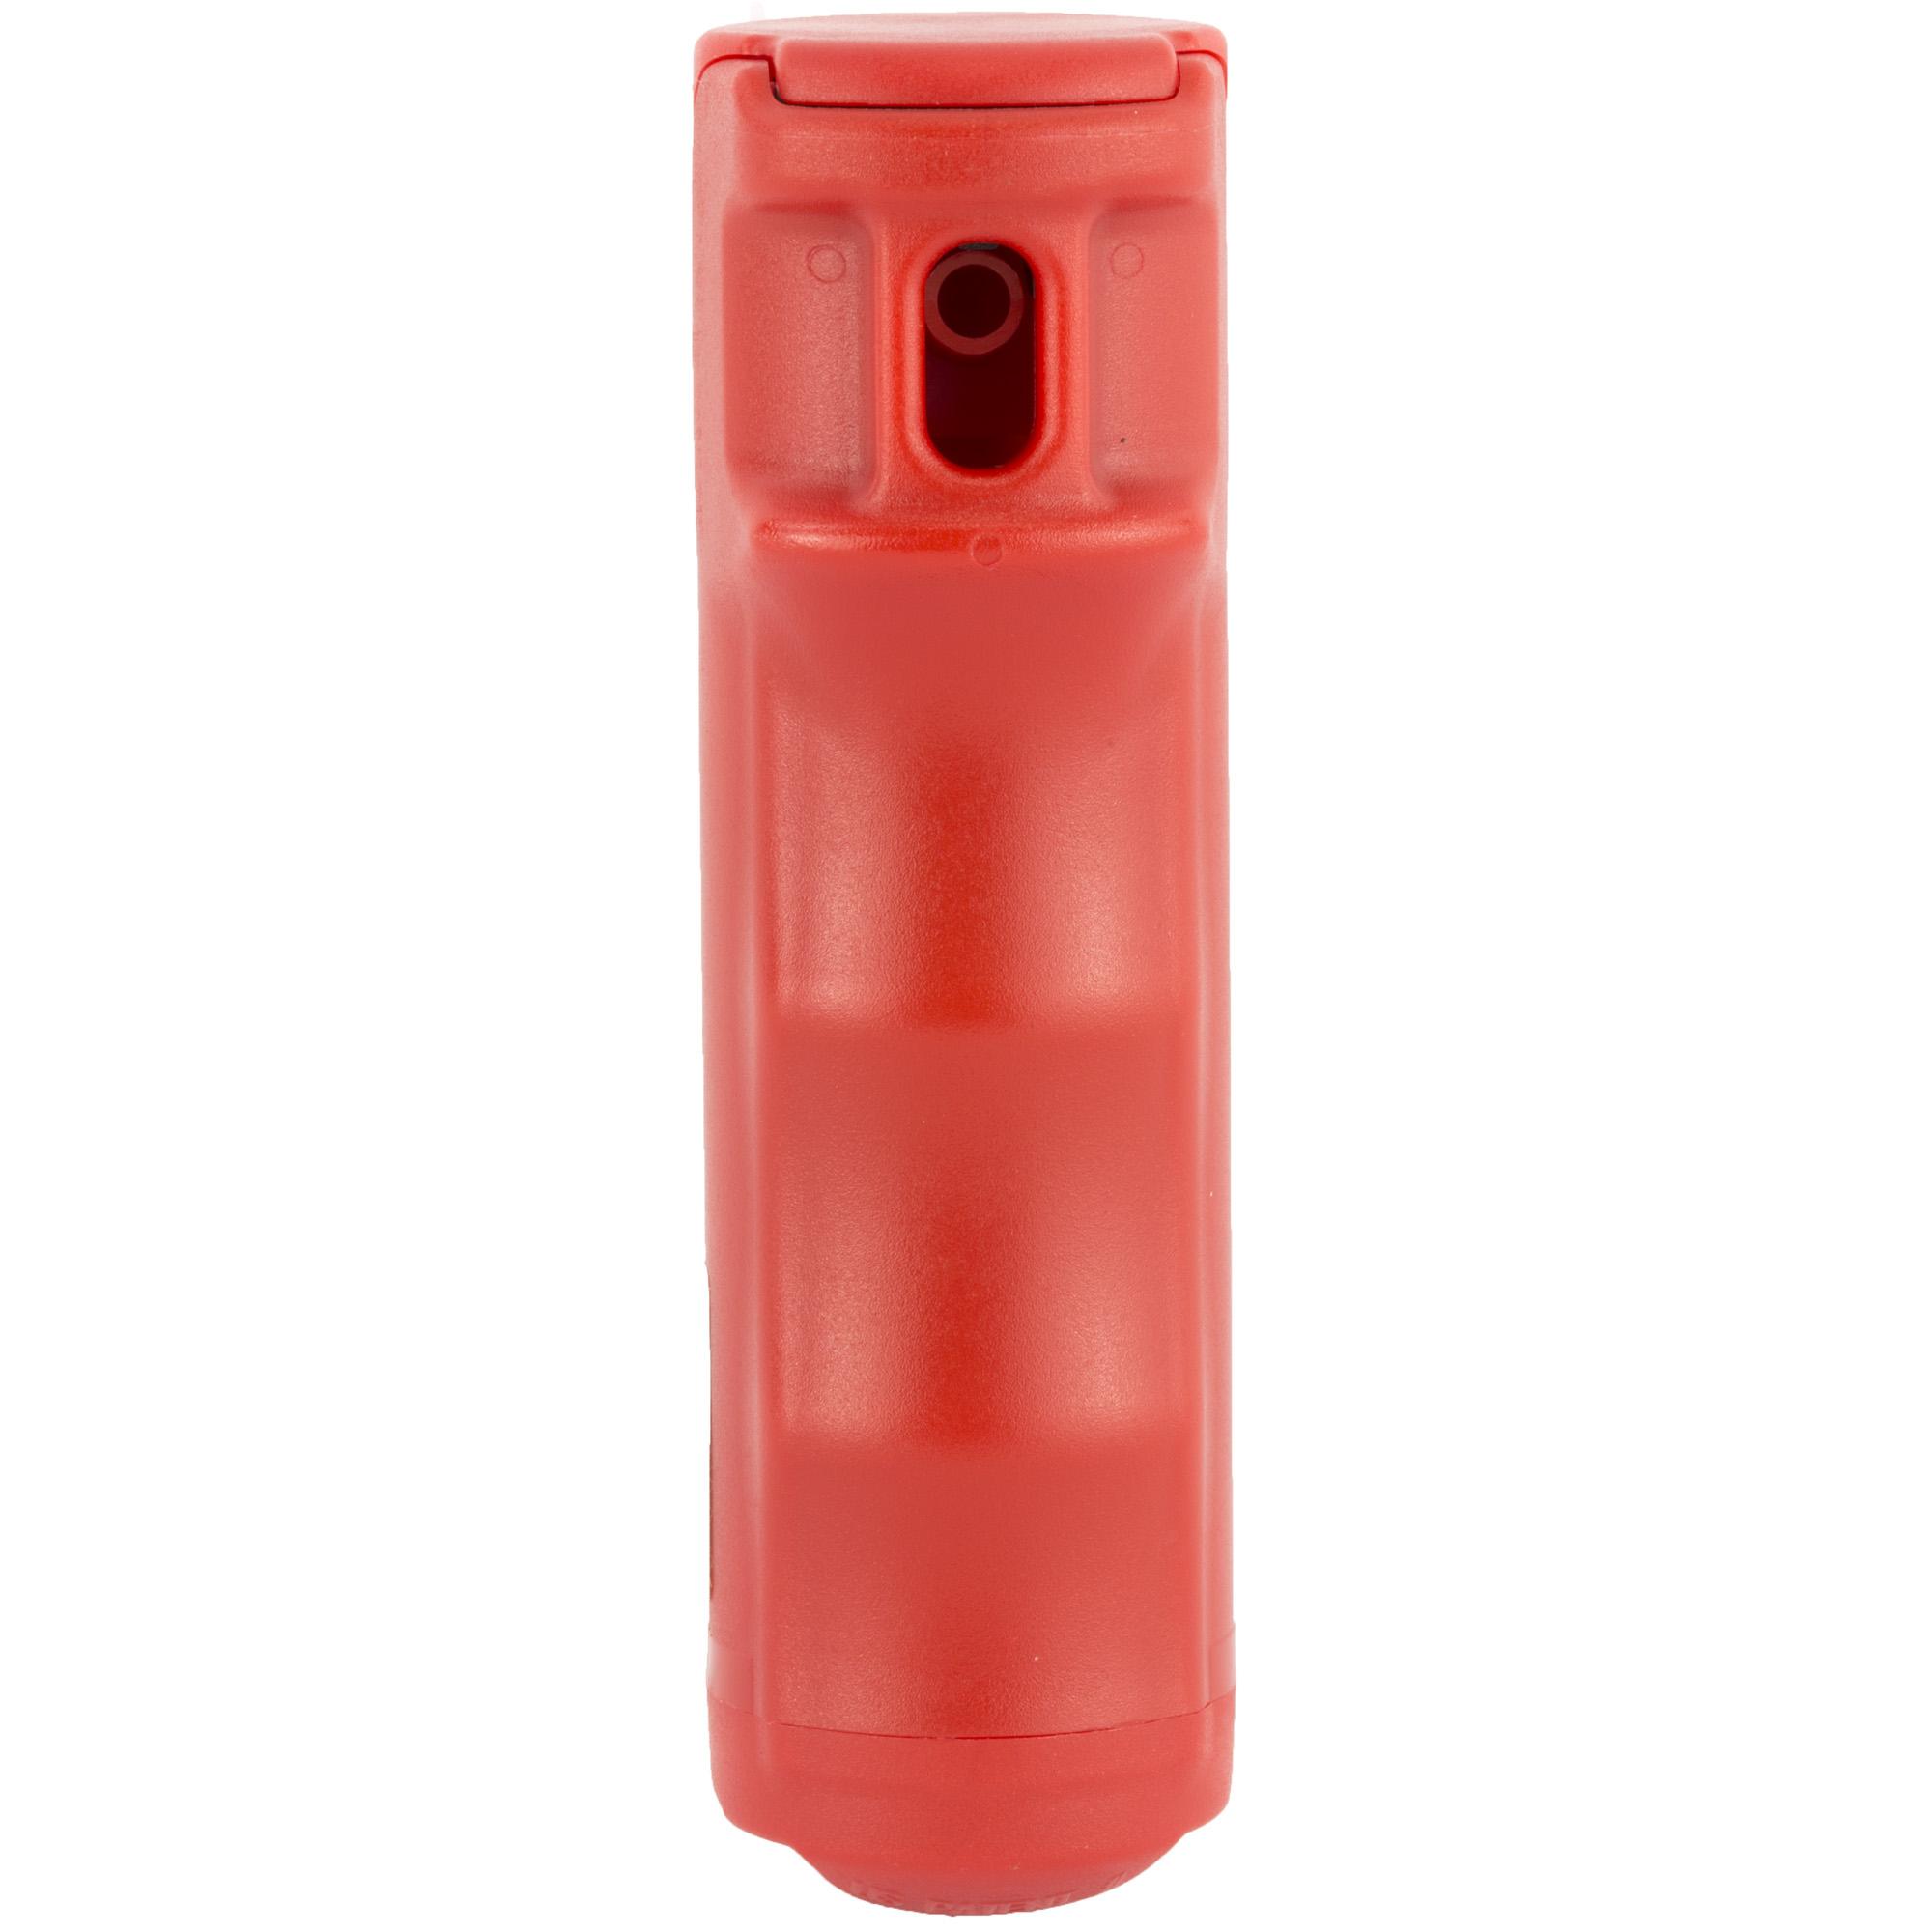 Msi 10% Pepper Keycase 11gm Red